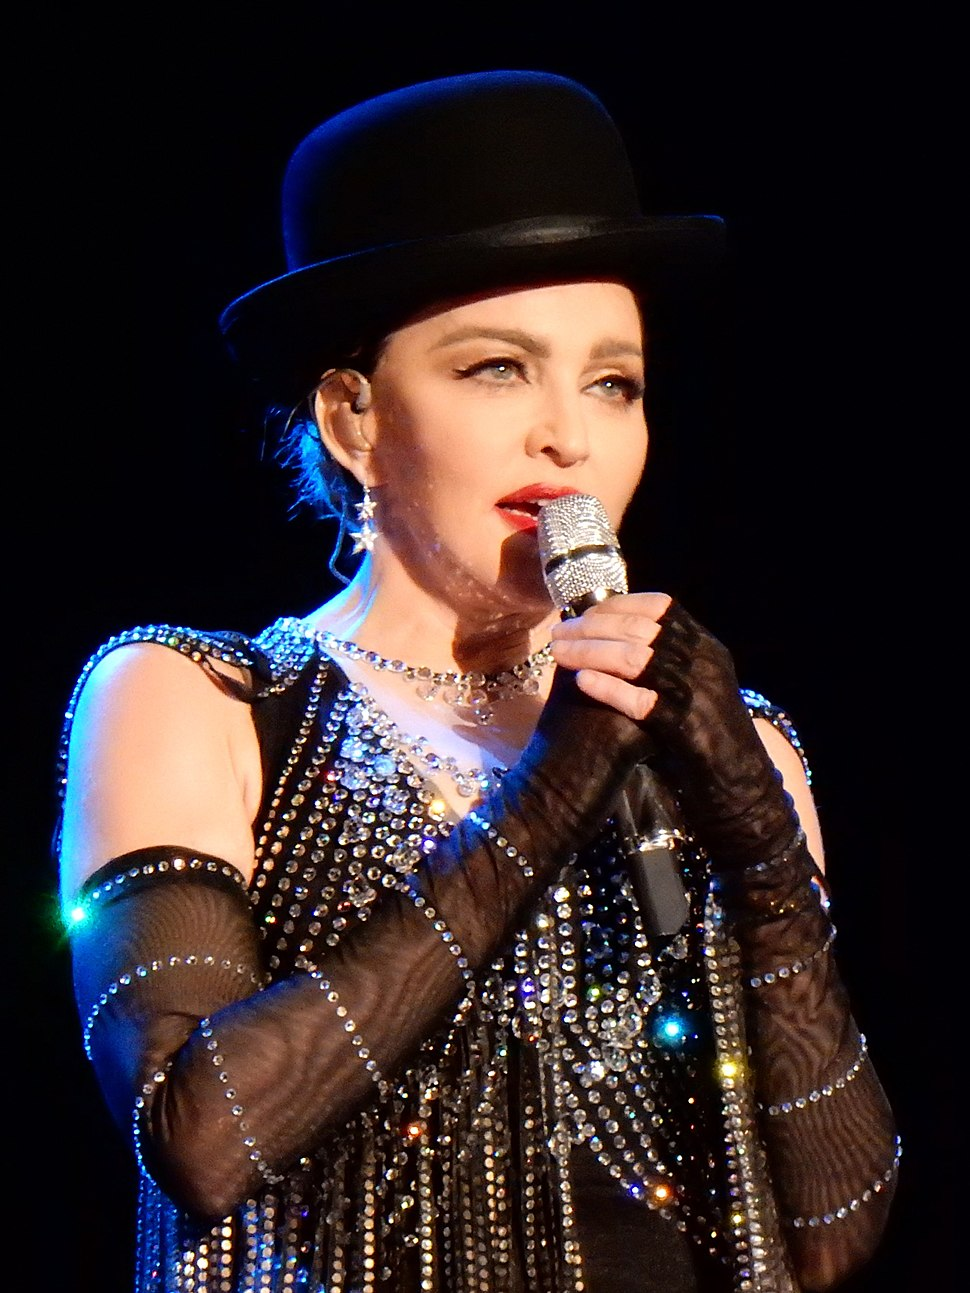 Madonna rebel heart tour dates in Melbourne